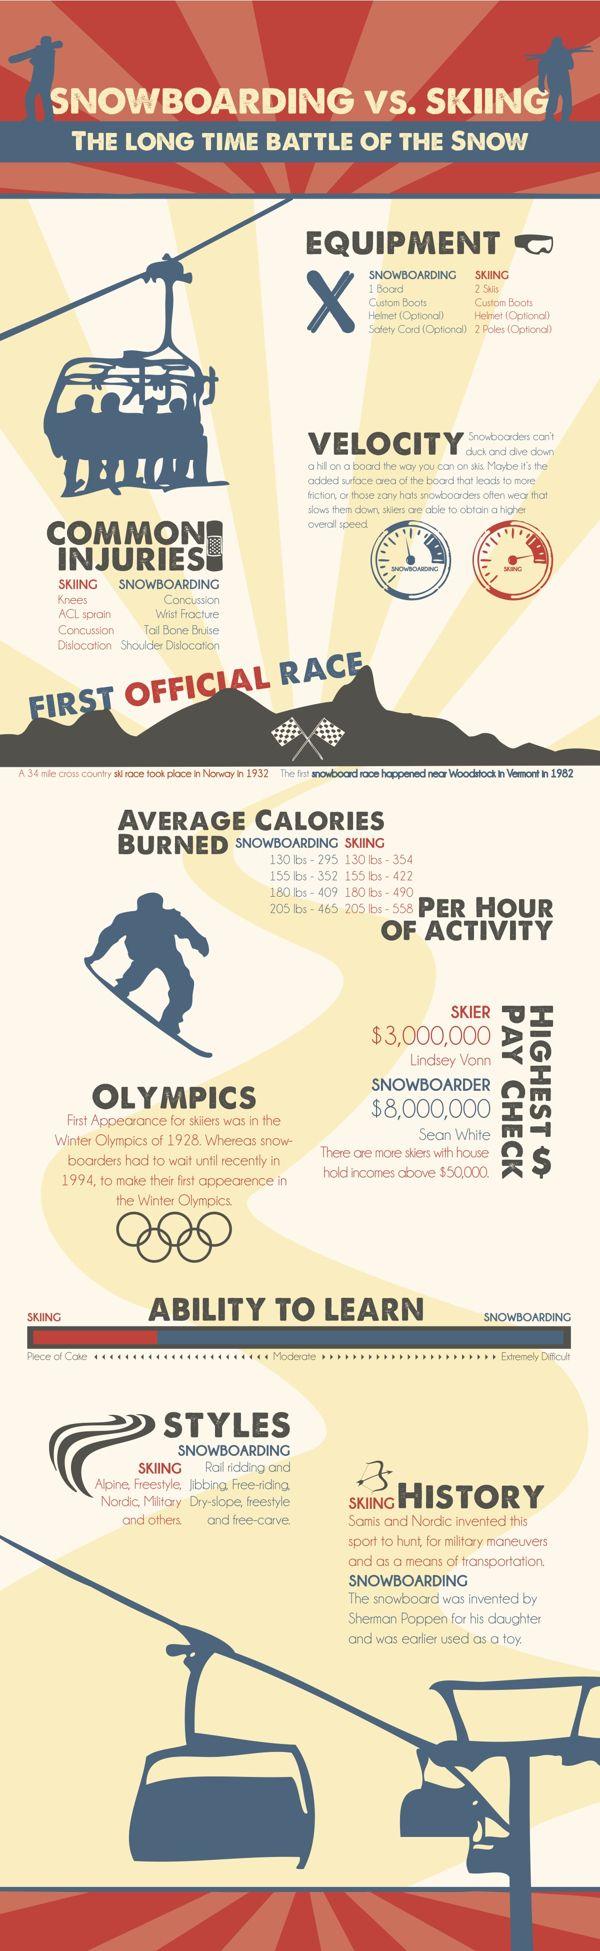 Snowboarding vs Skiing Infographic by Julia Donigian, via Behance